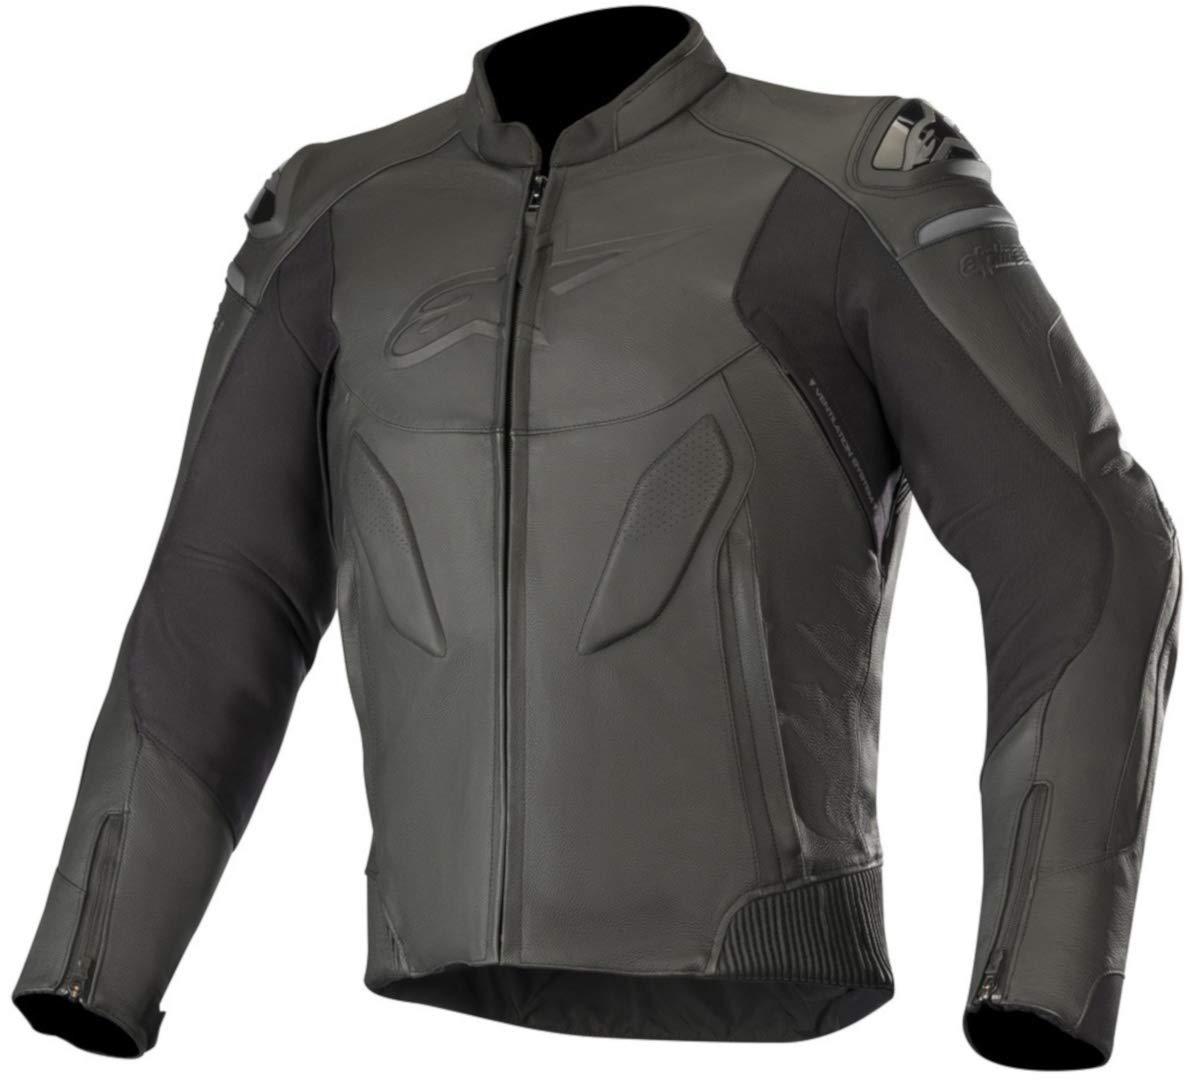 e71f63b0d9e Alpinestars Caliber Chaqueta de piel para moto